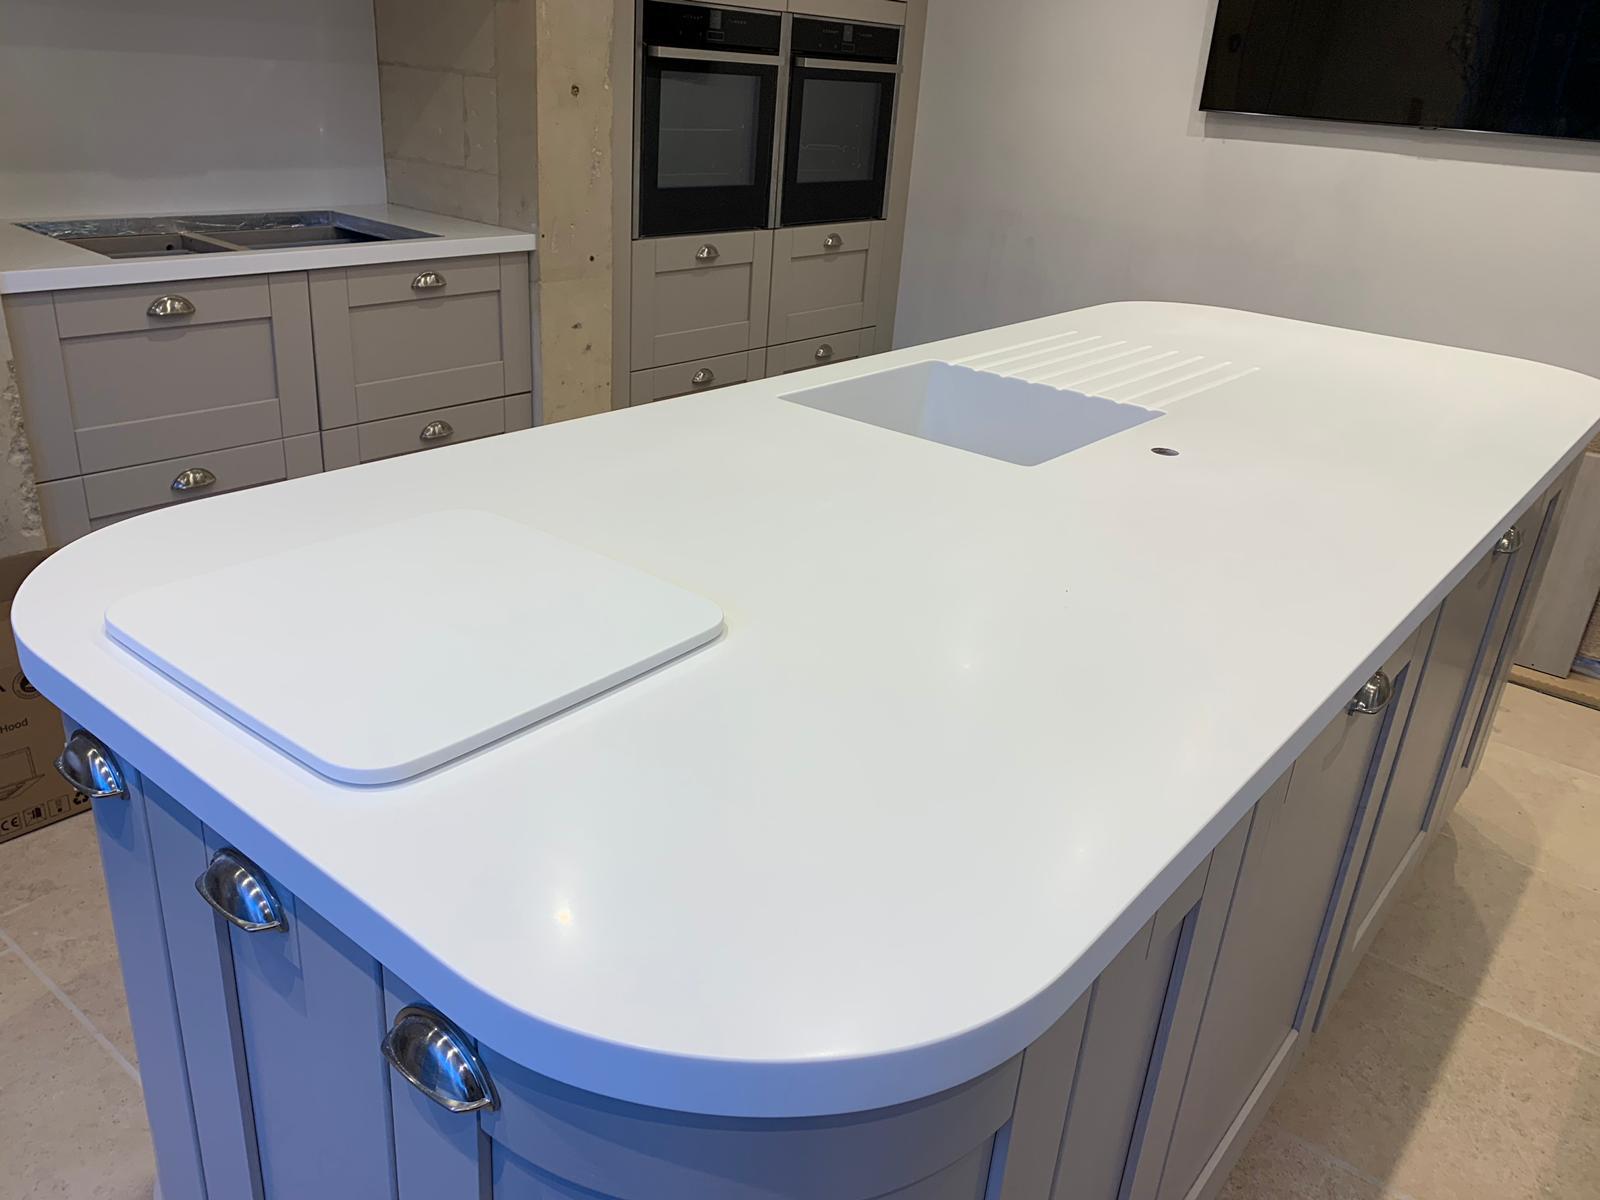 Corian Island and worktops installed Wiltshire